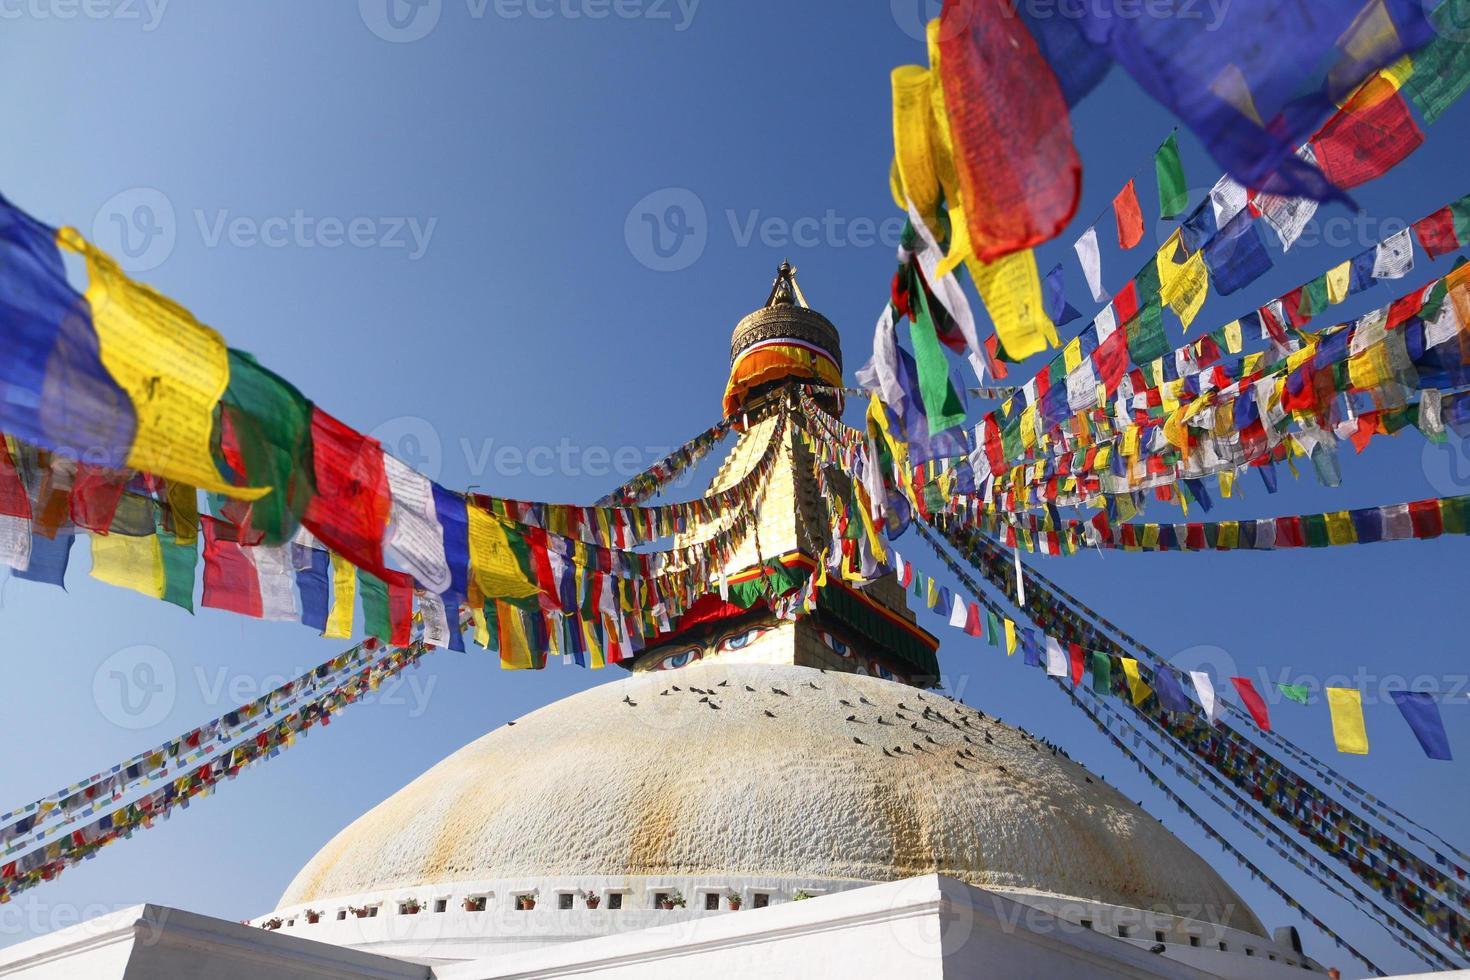 stupa bodhnath con bandiere colorate a kathmandu, nepal foto